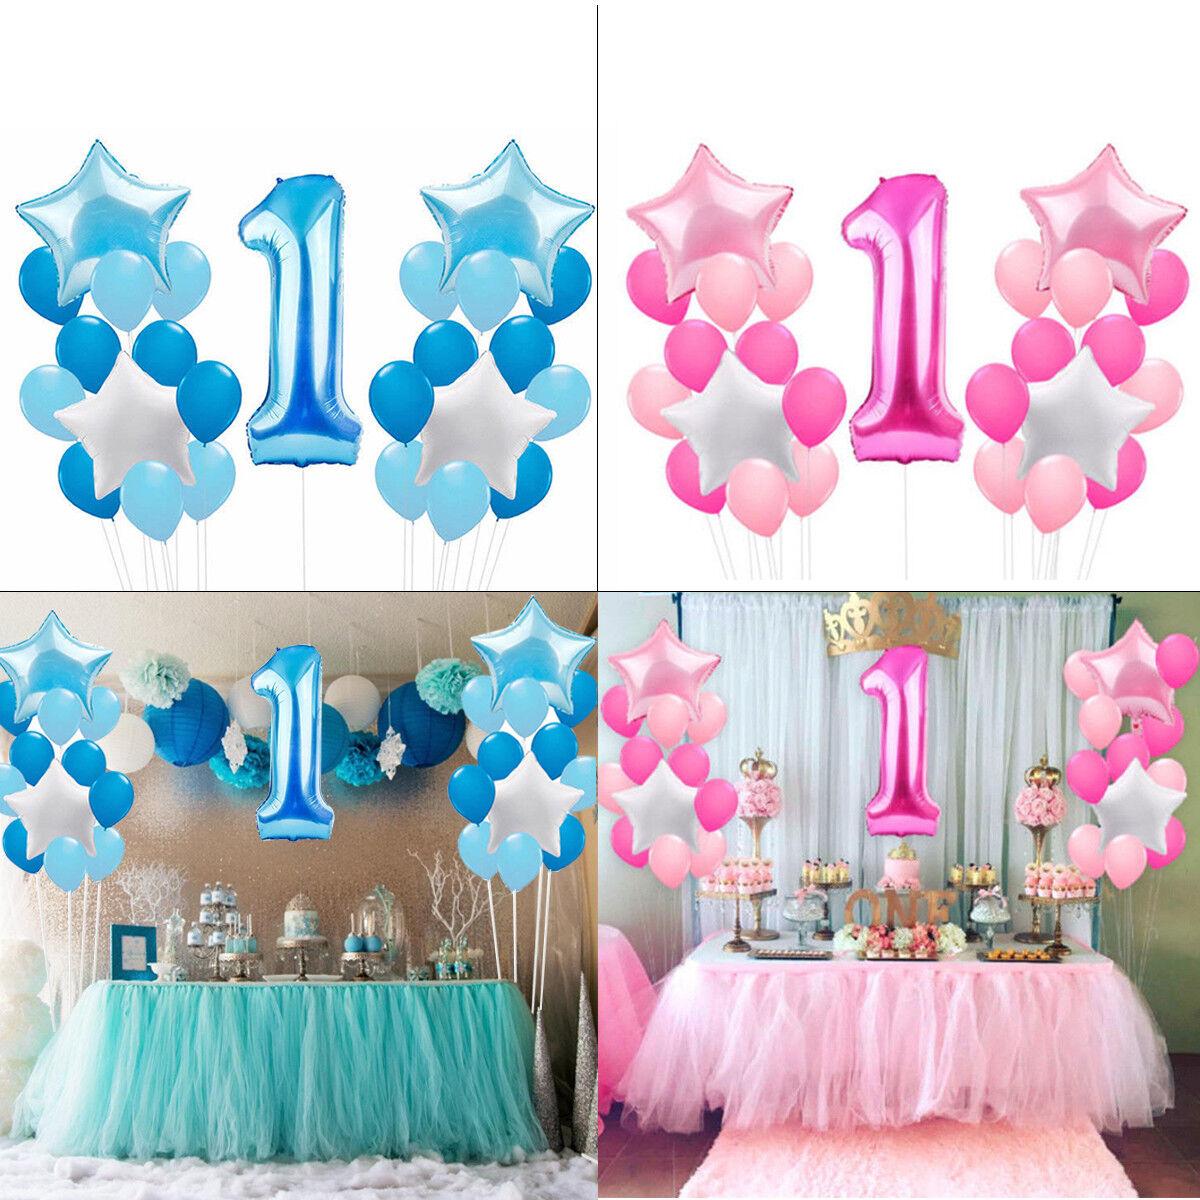 25pcs Foil Latex Balloons Set 1st Birthday Party Decorations Boy Girl Pink Blue Ebay